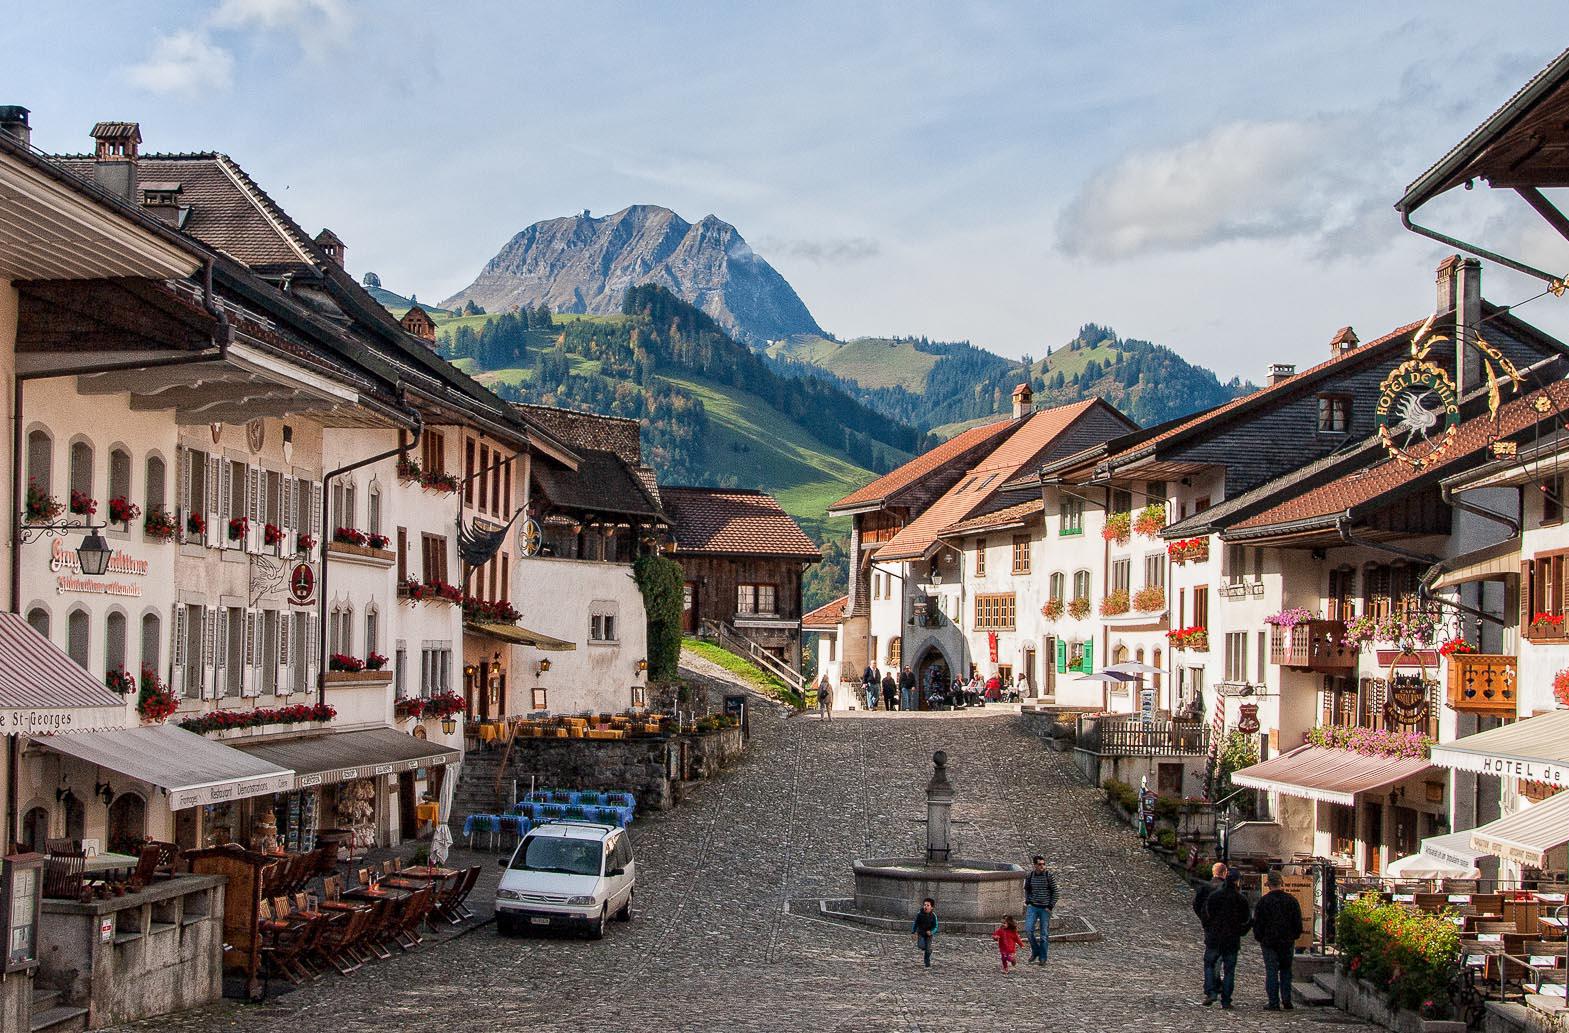 Грюйер, Швейцария